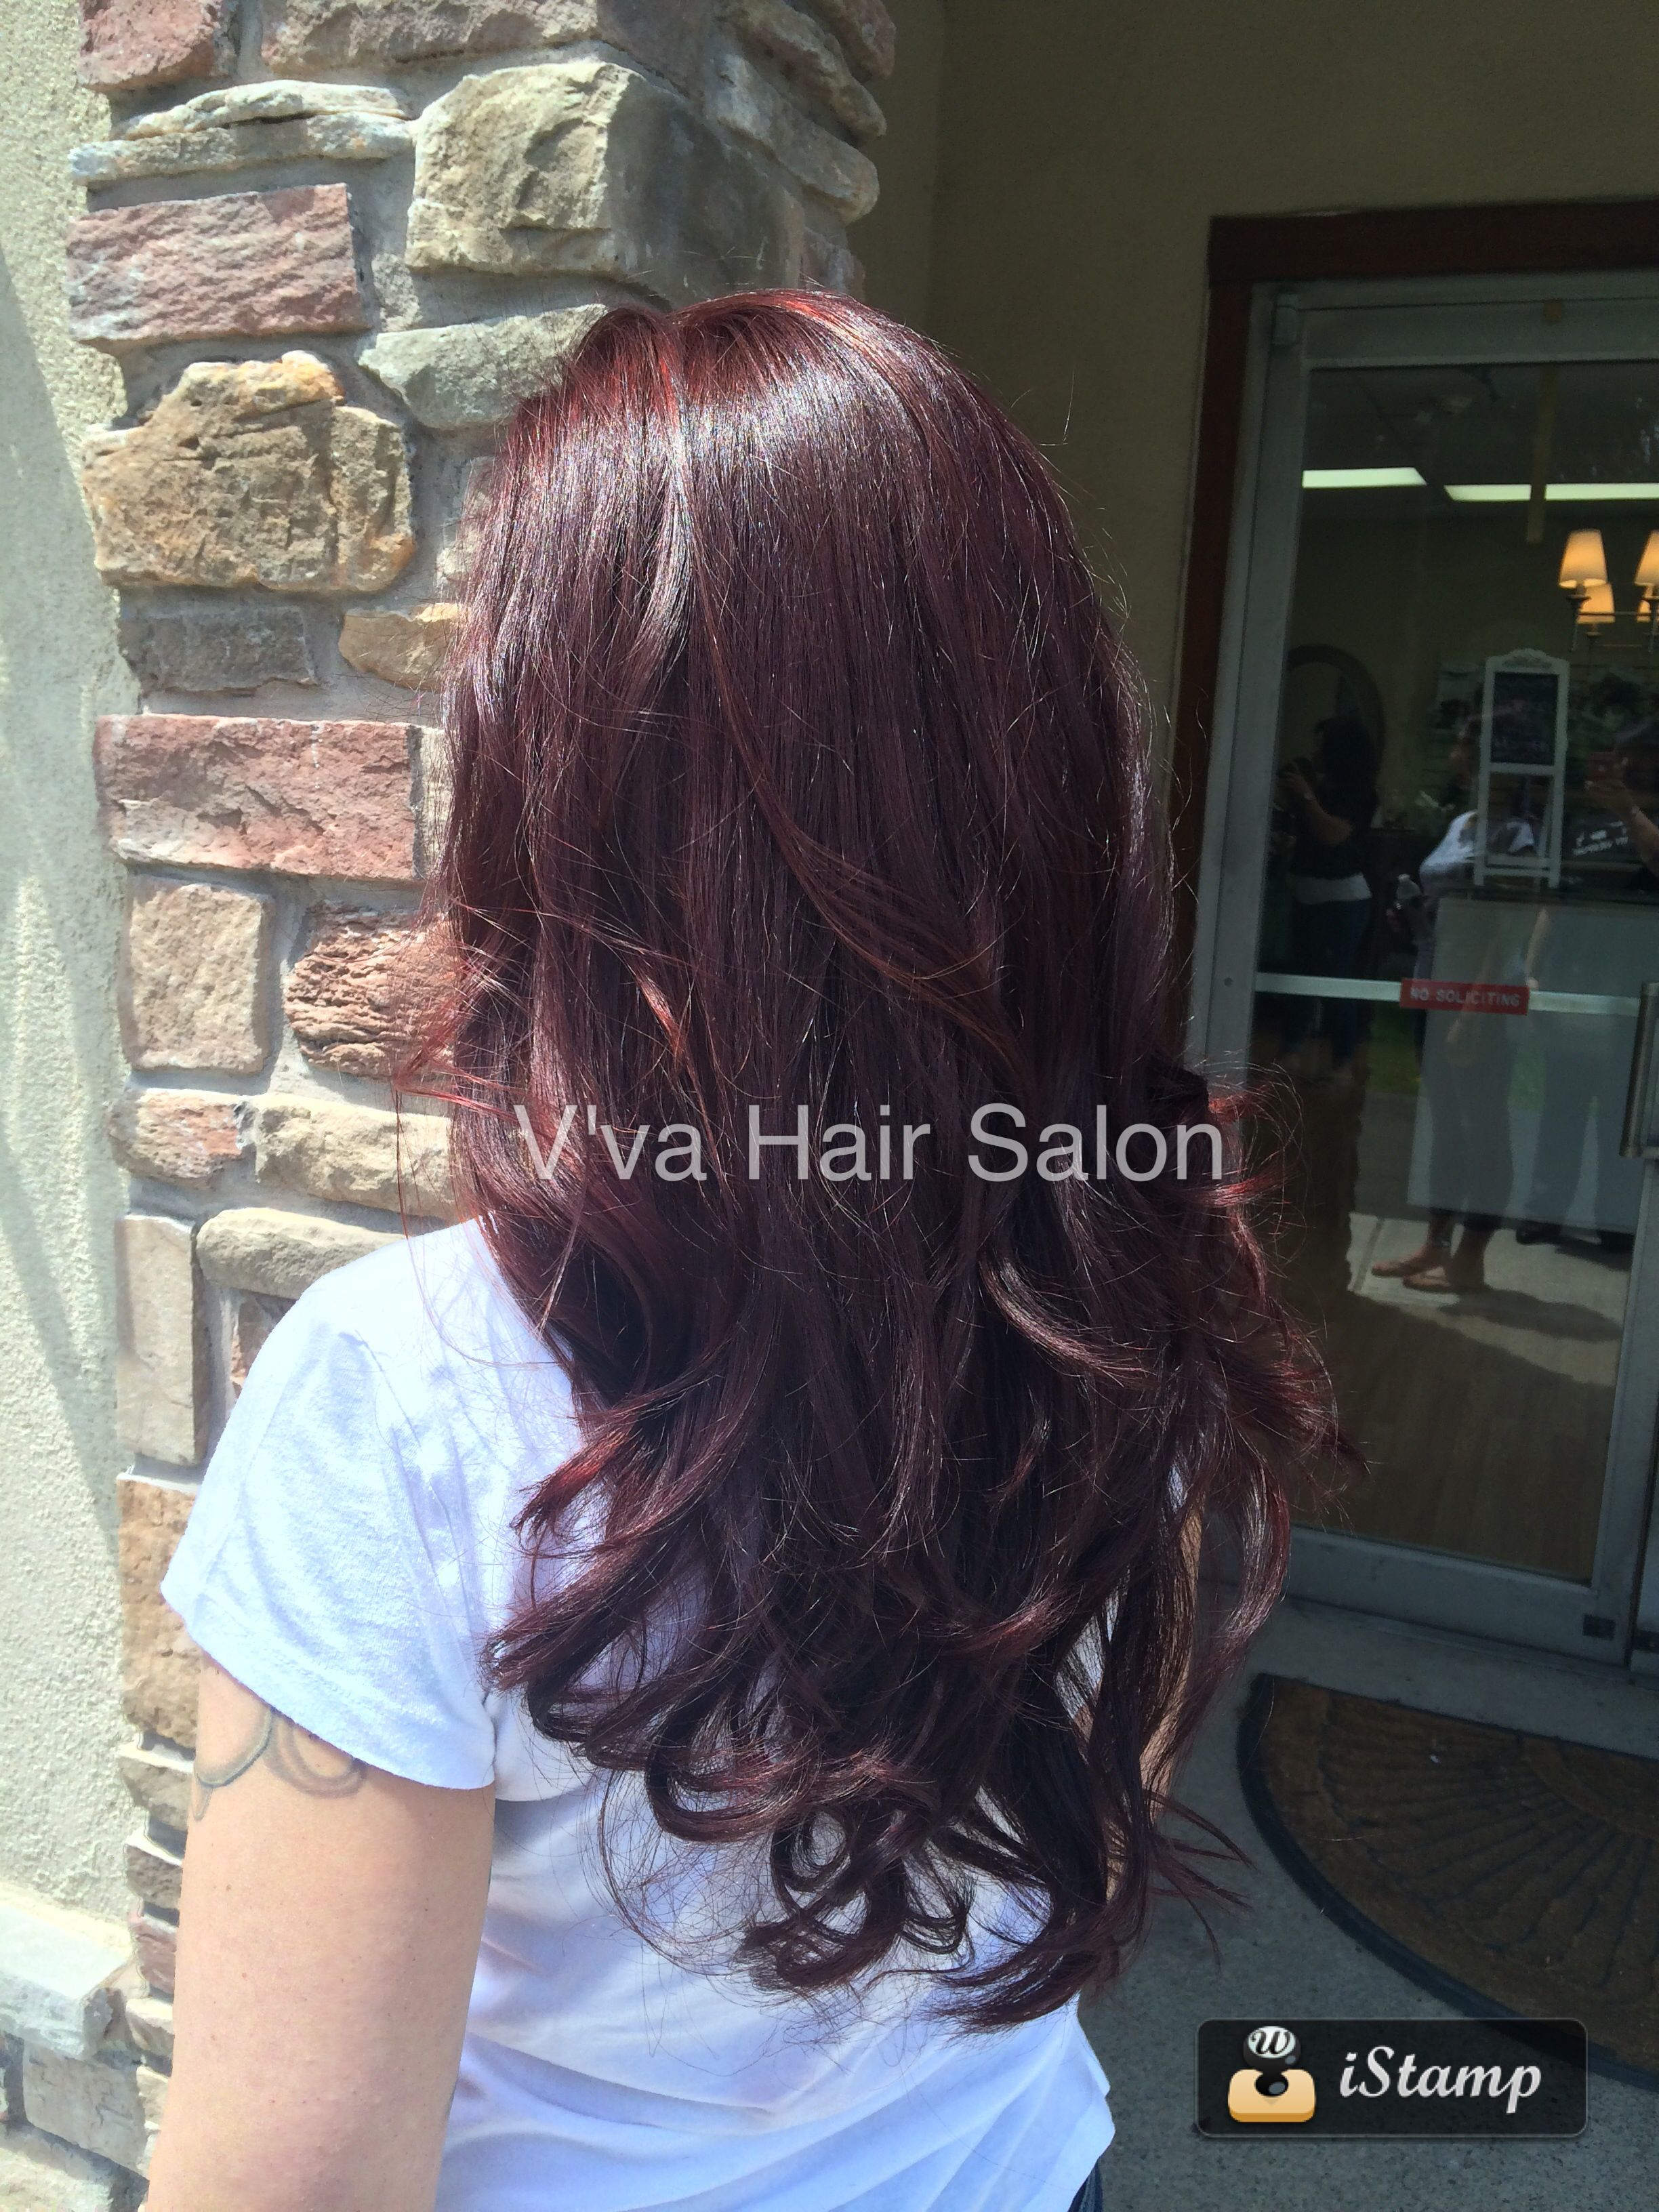 Long Layers True Rich Auburn Hair By Vanessa At Vva Hair Salon